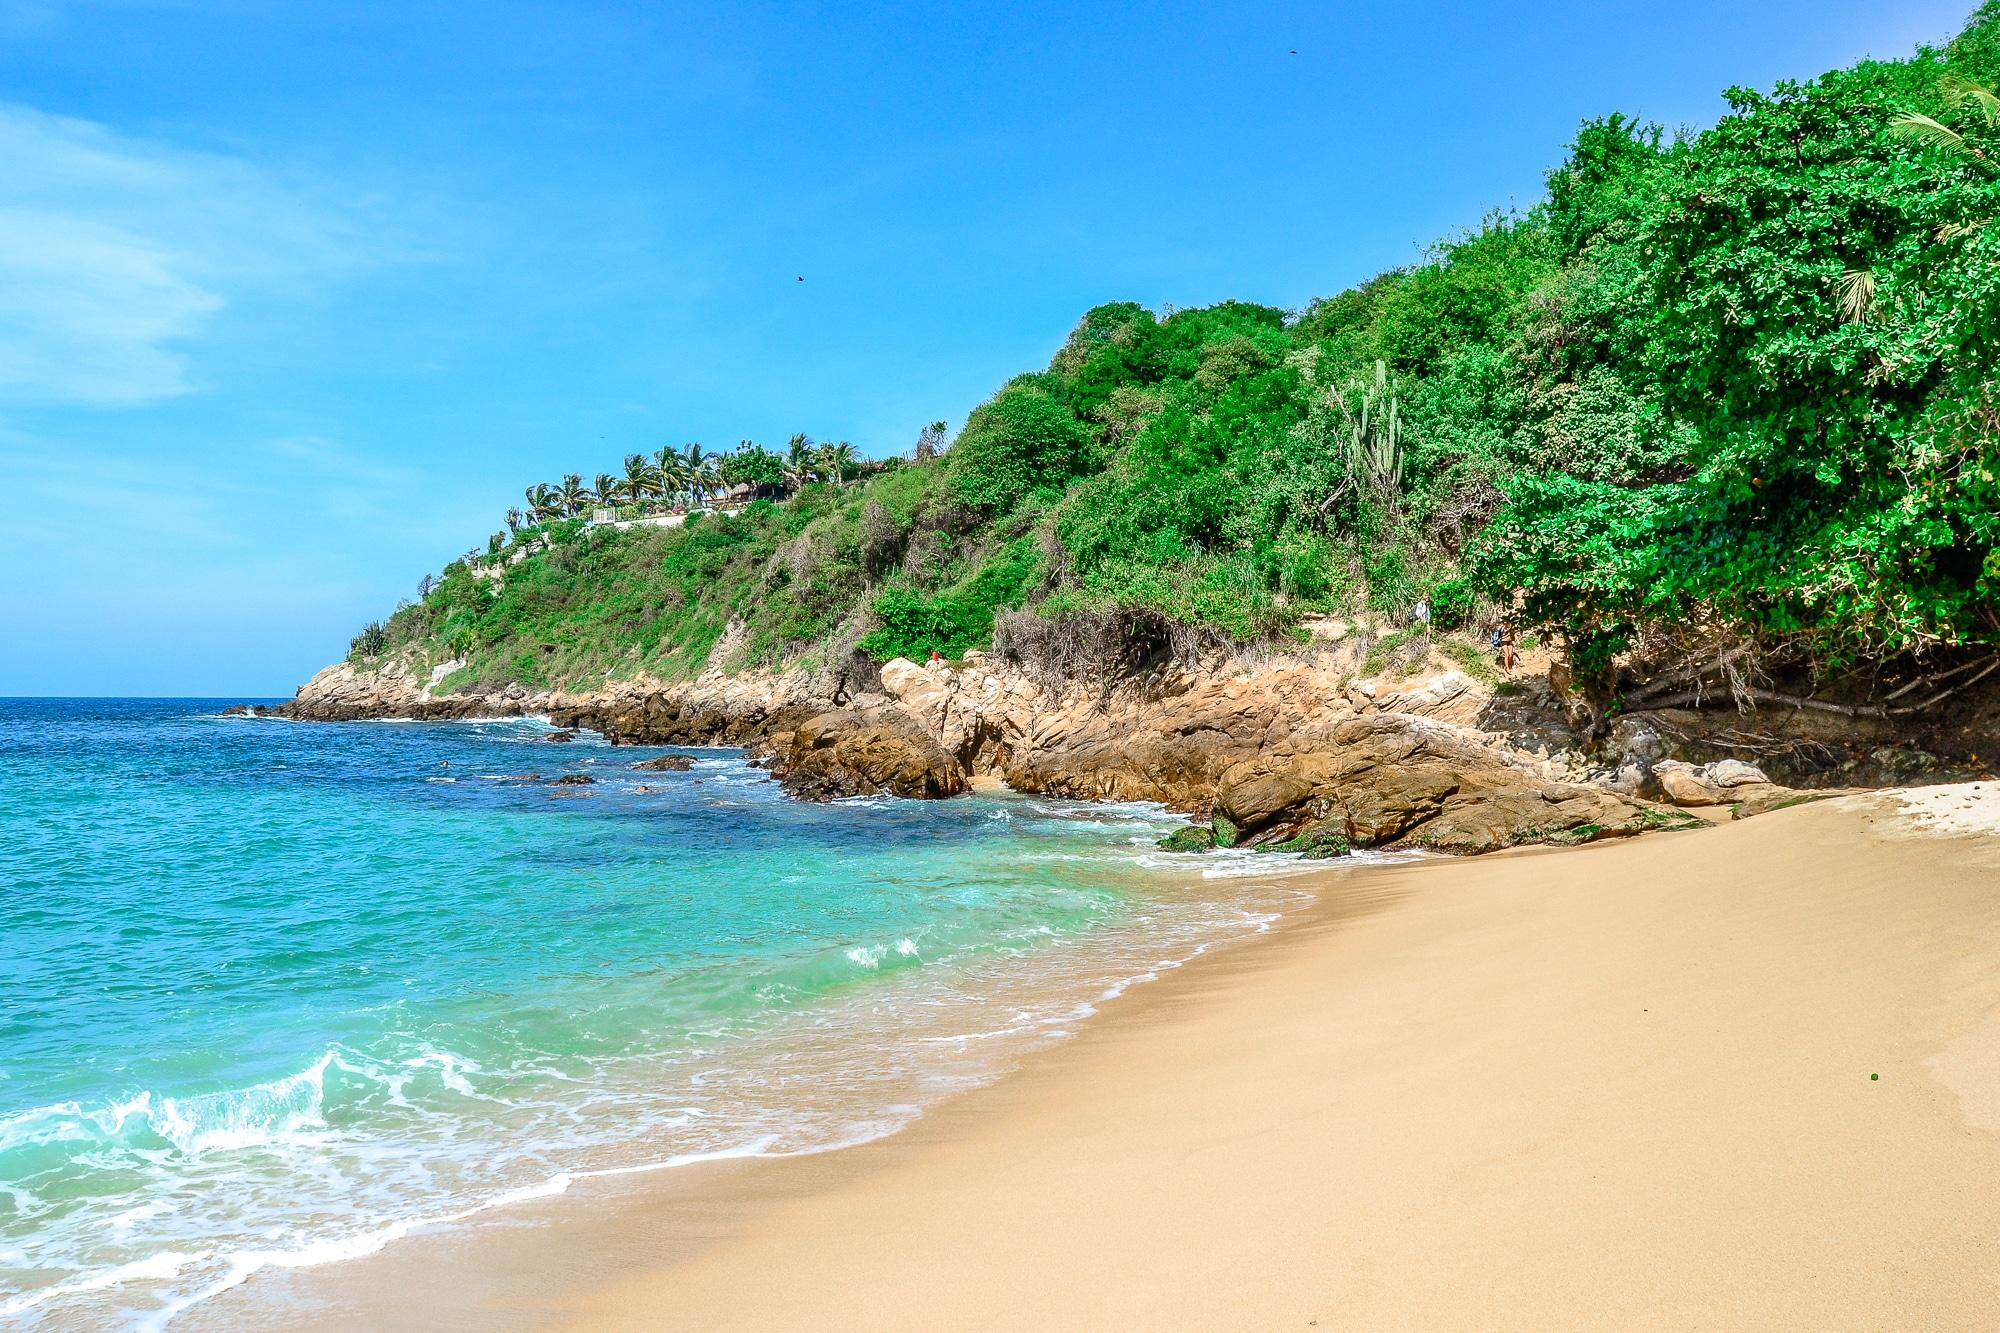 Playa Carrizalillo Strand in Puerto Escondido